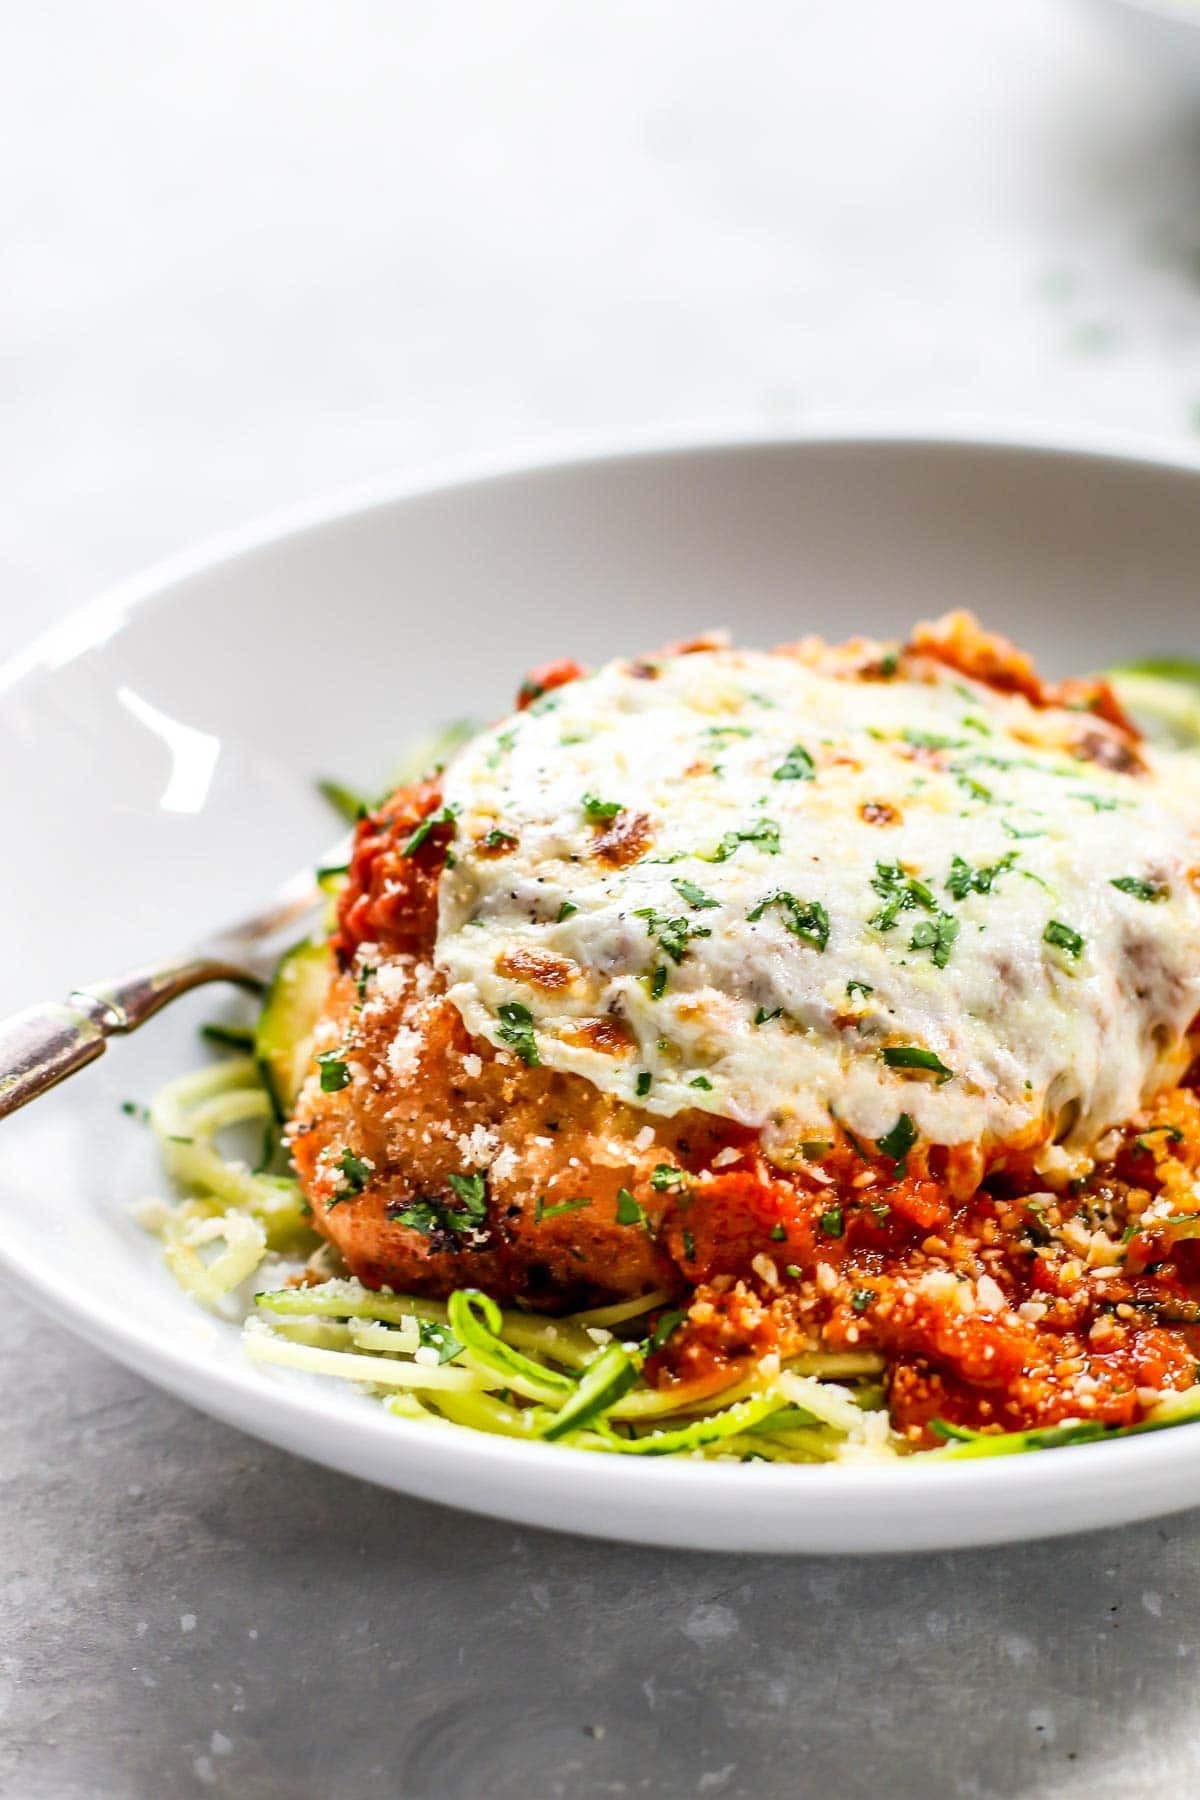 Healthy Italian Chicken Recipes  20 Minute Healthy Chicken Parmesan Recipe Pinch of Yum